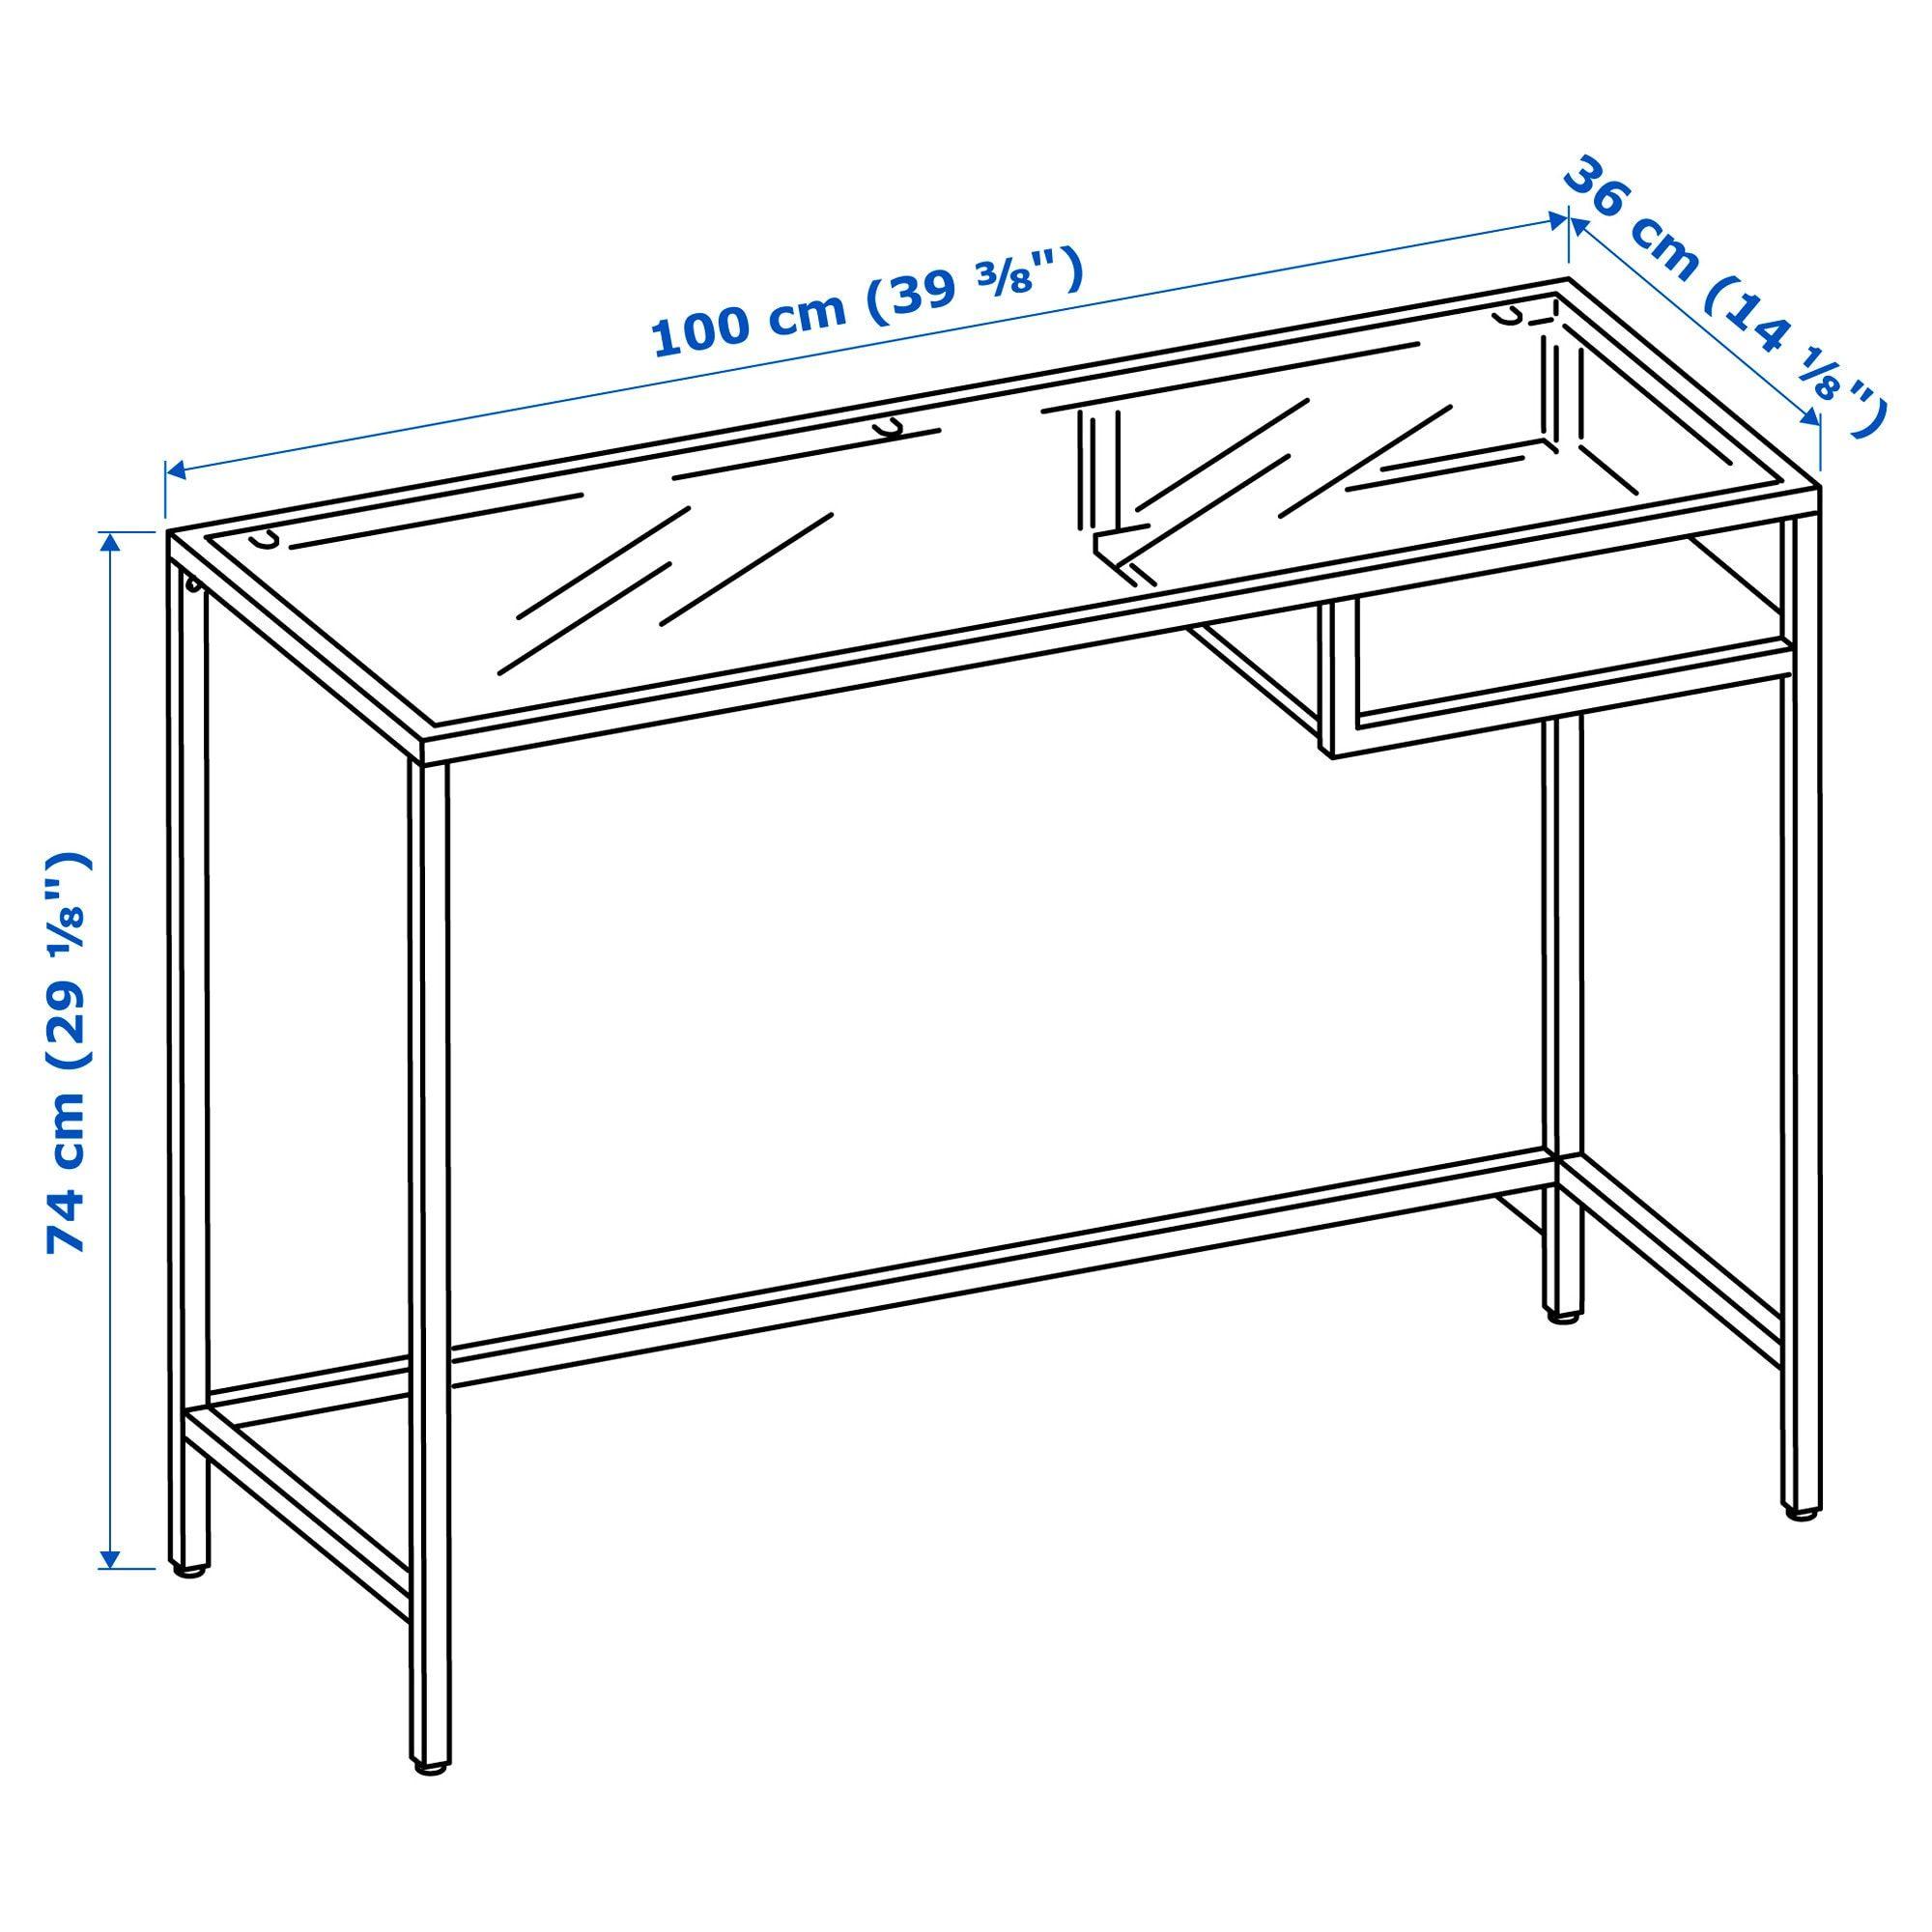 Vittsjo Laptop Table Black Brown Glass 393 8x141 8 100x36 Cm Ikea Laptop Table White Glass Craft Tables With Storage [ 2000 x 2000 Pixel ]